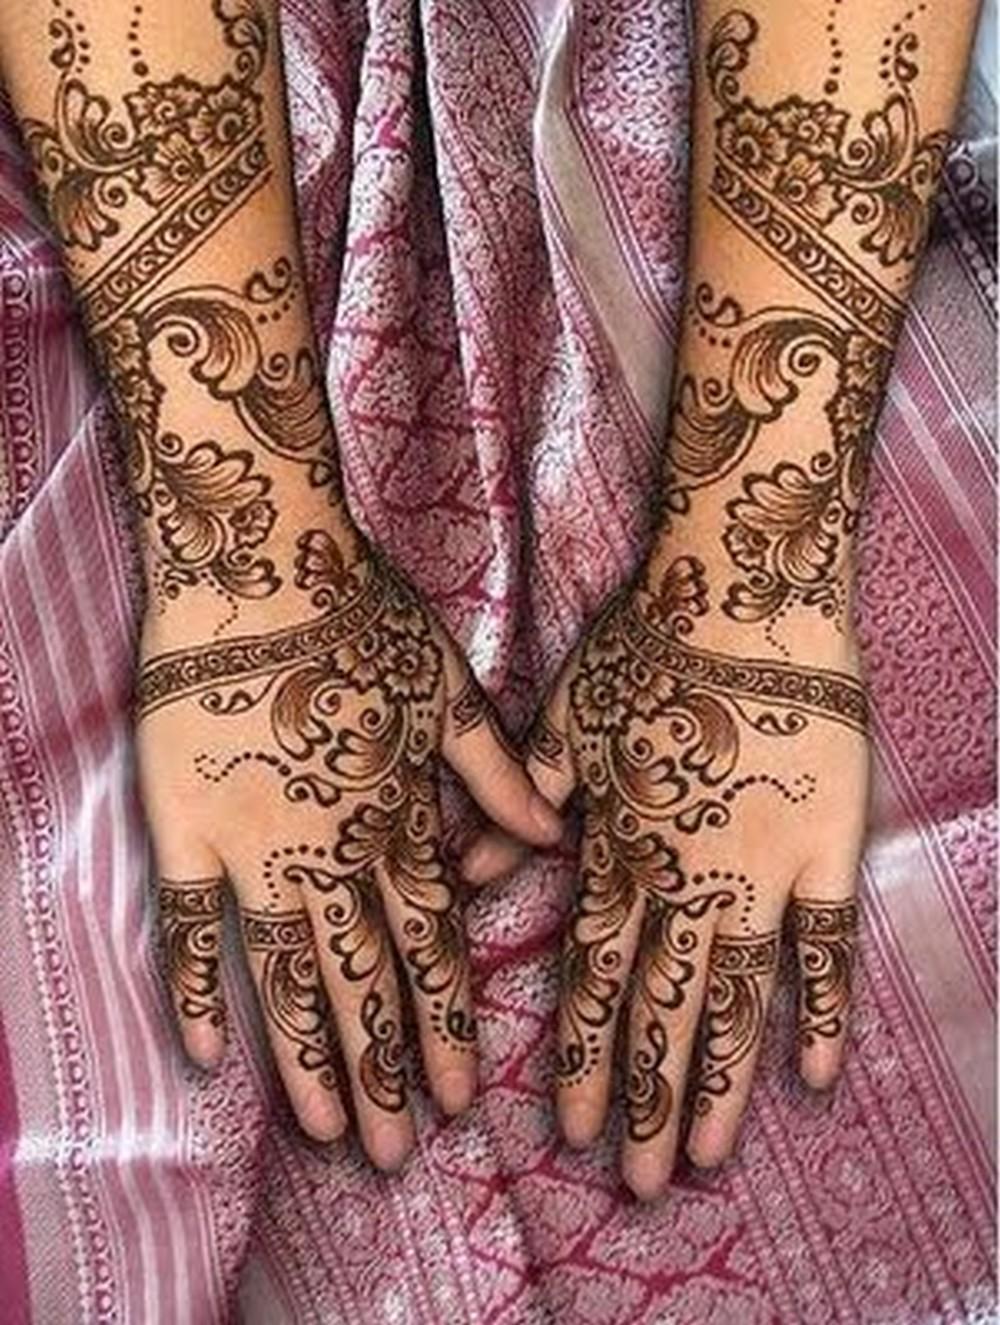 Mehndi Designs For Hands For Engagement : Mehndi designs engagement